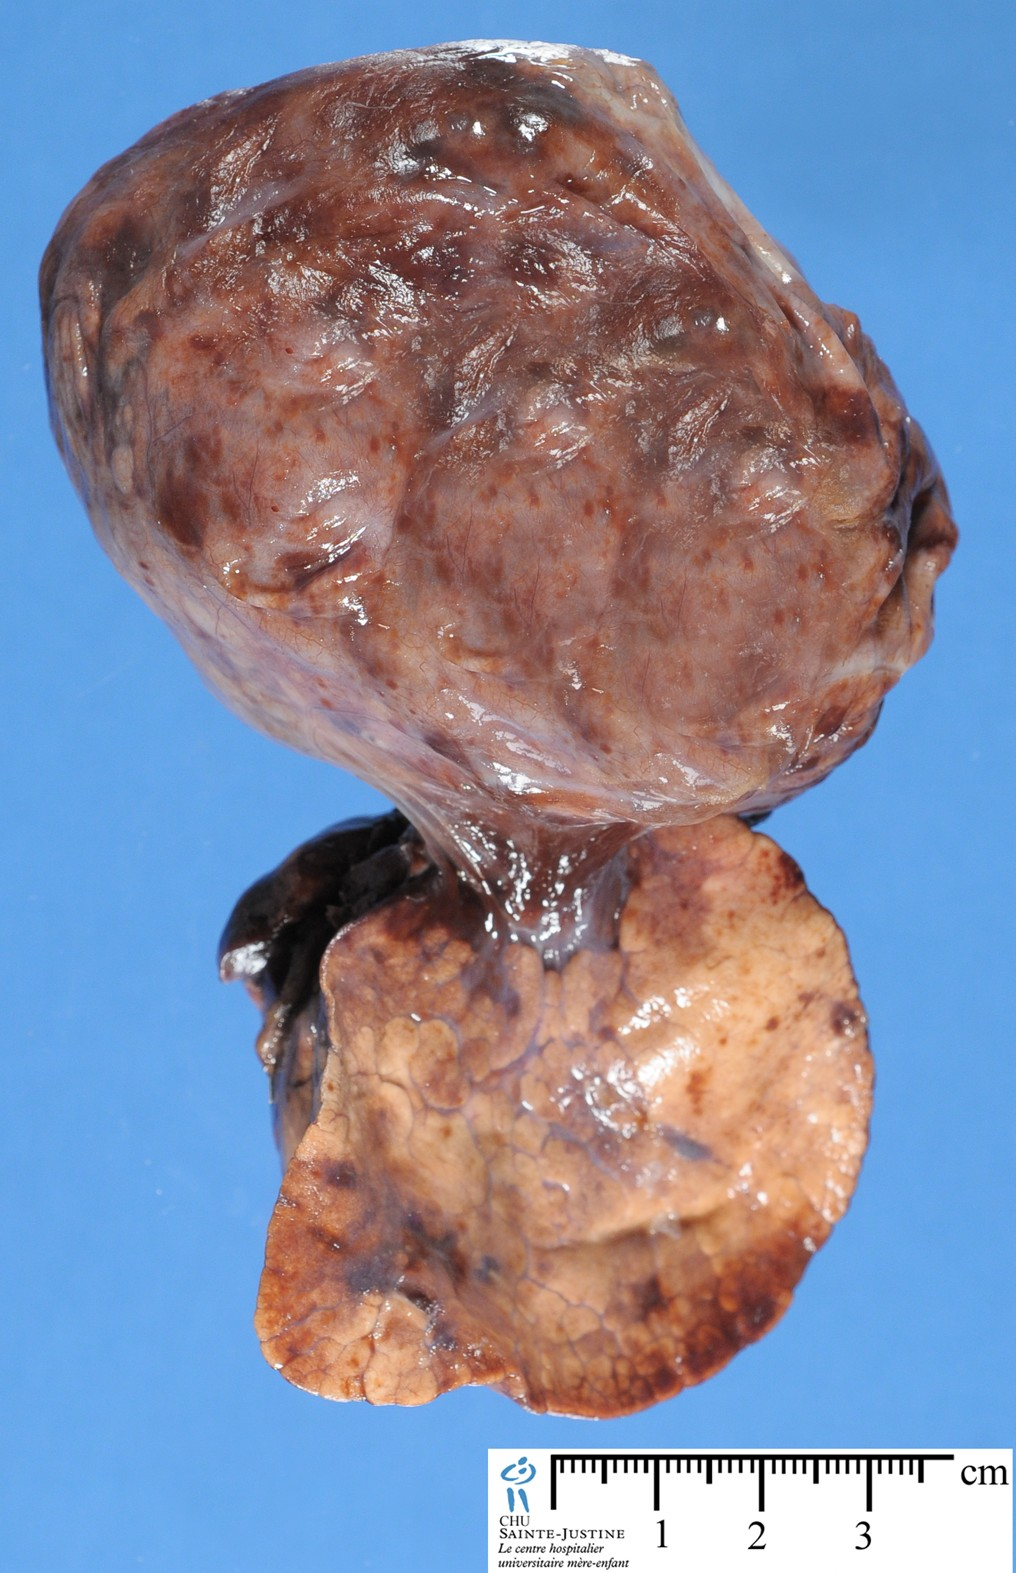 Jpg Pleuropulmonary Blastoma Ab